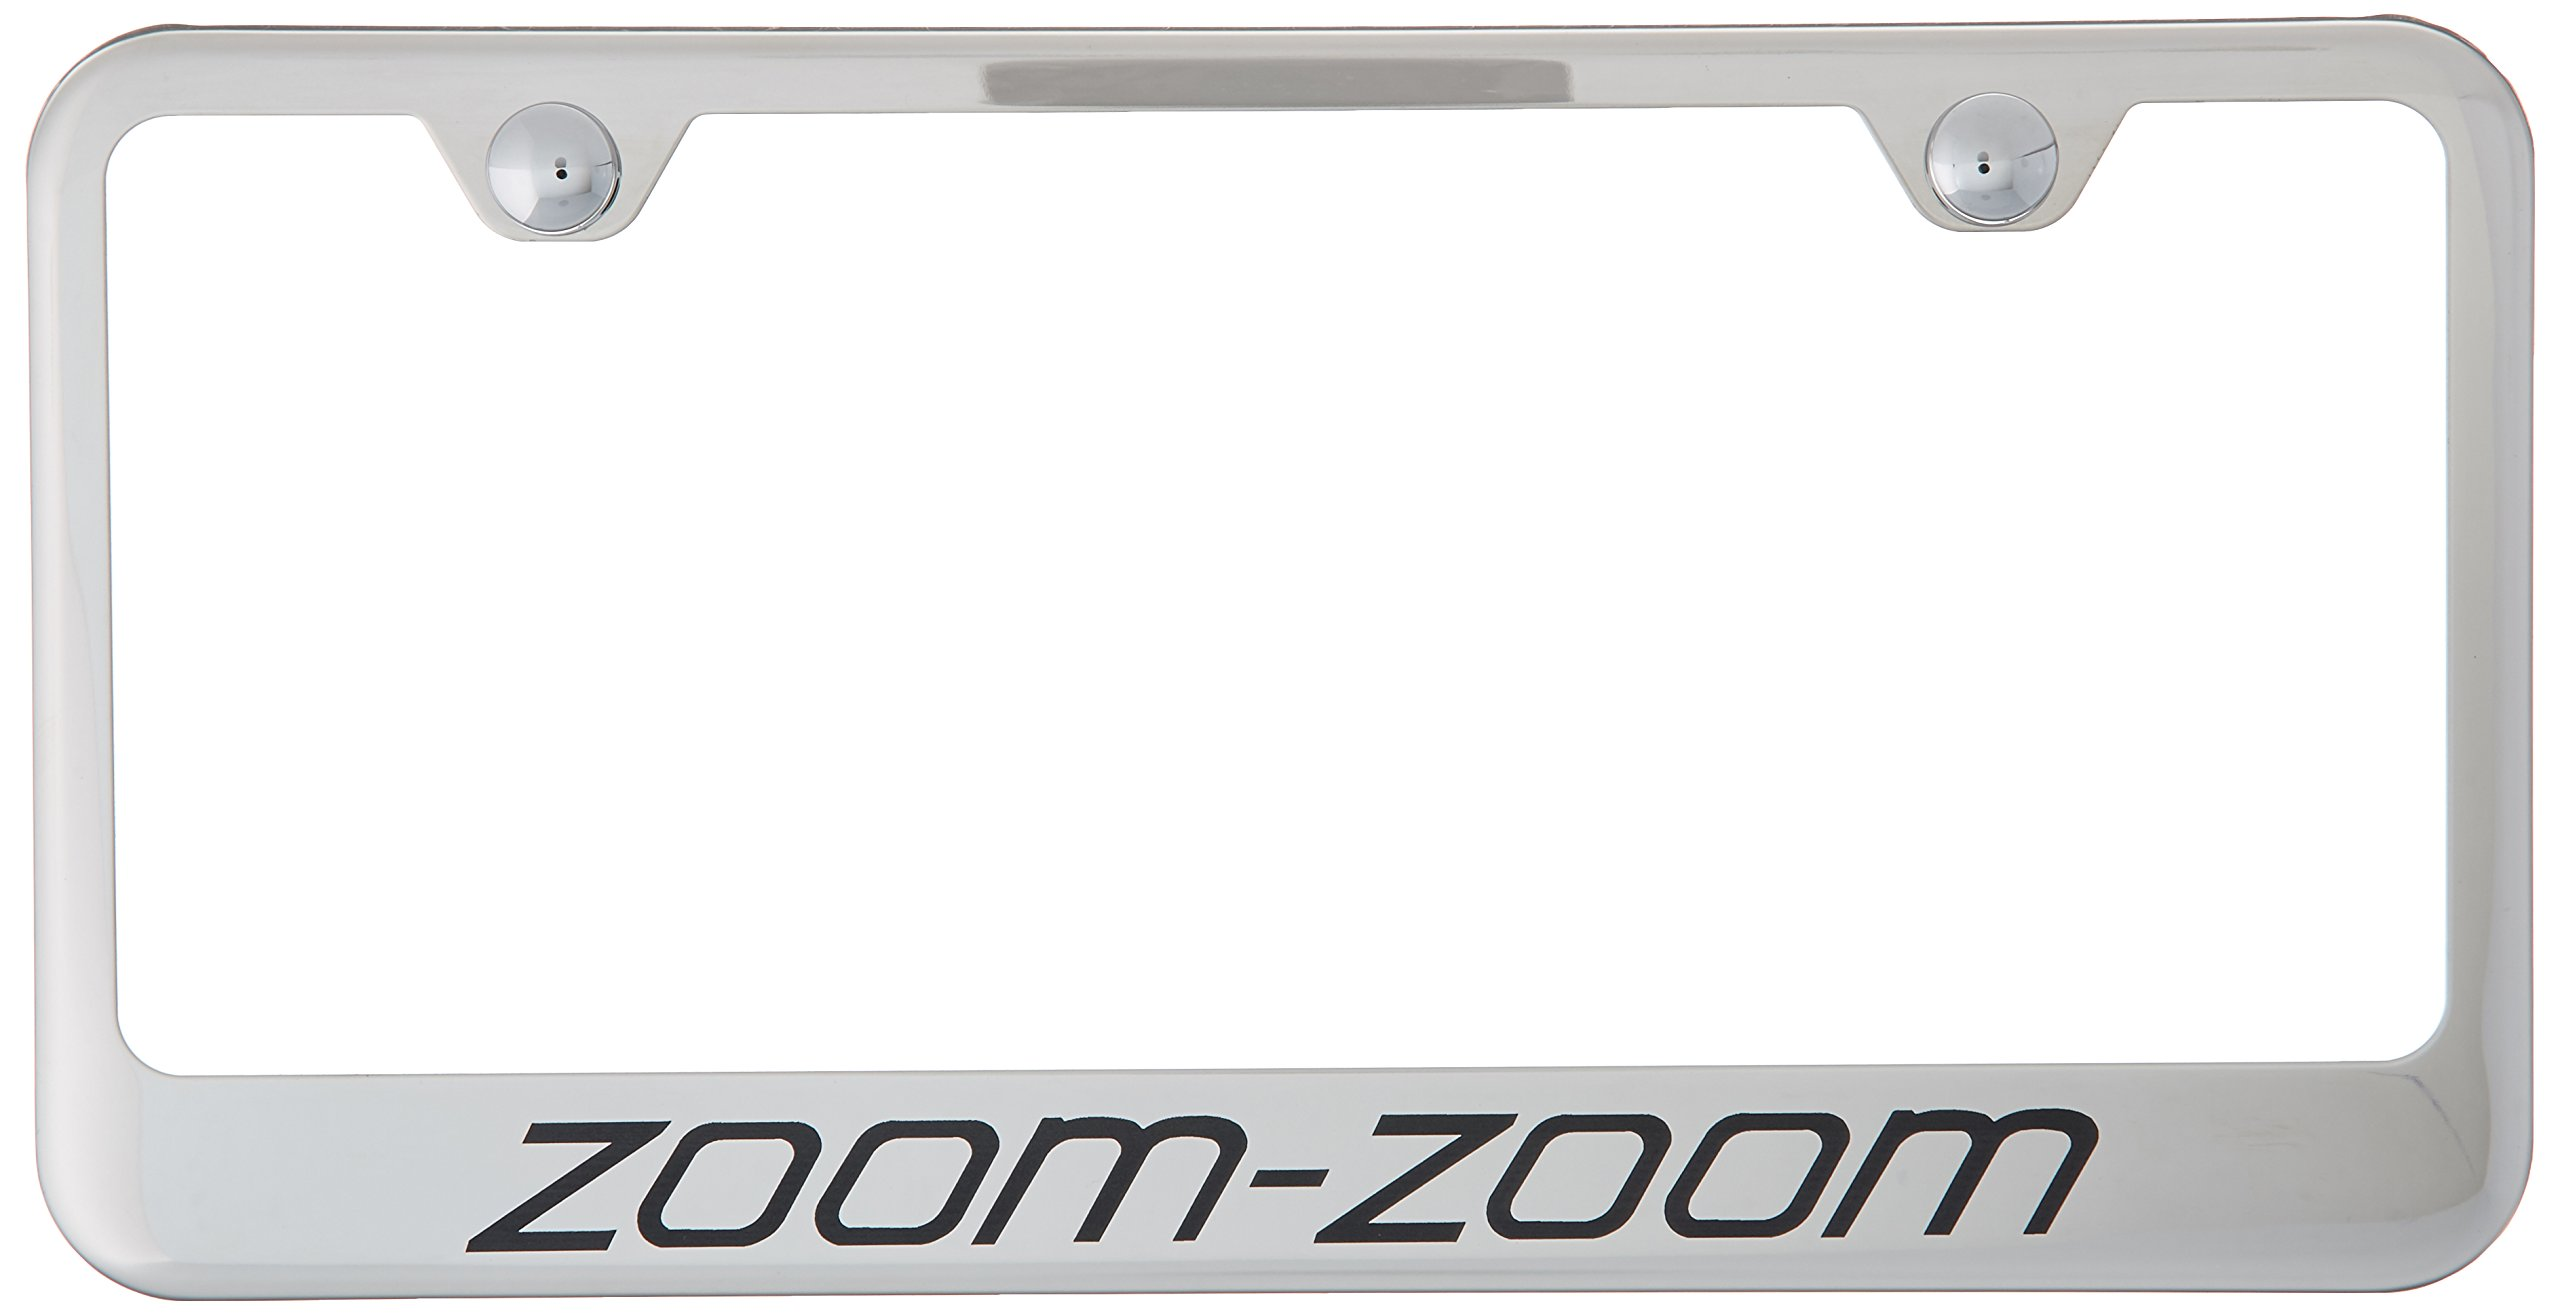 Amazon.com: Mazda Zoom-Zoom License Plate Frame: Automotive